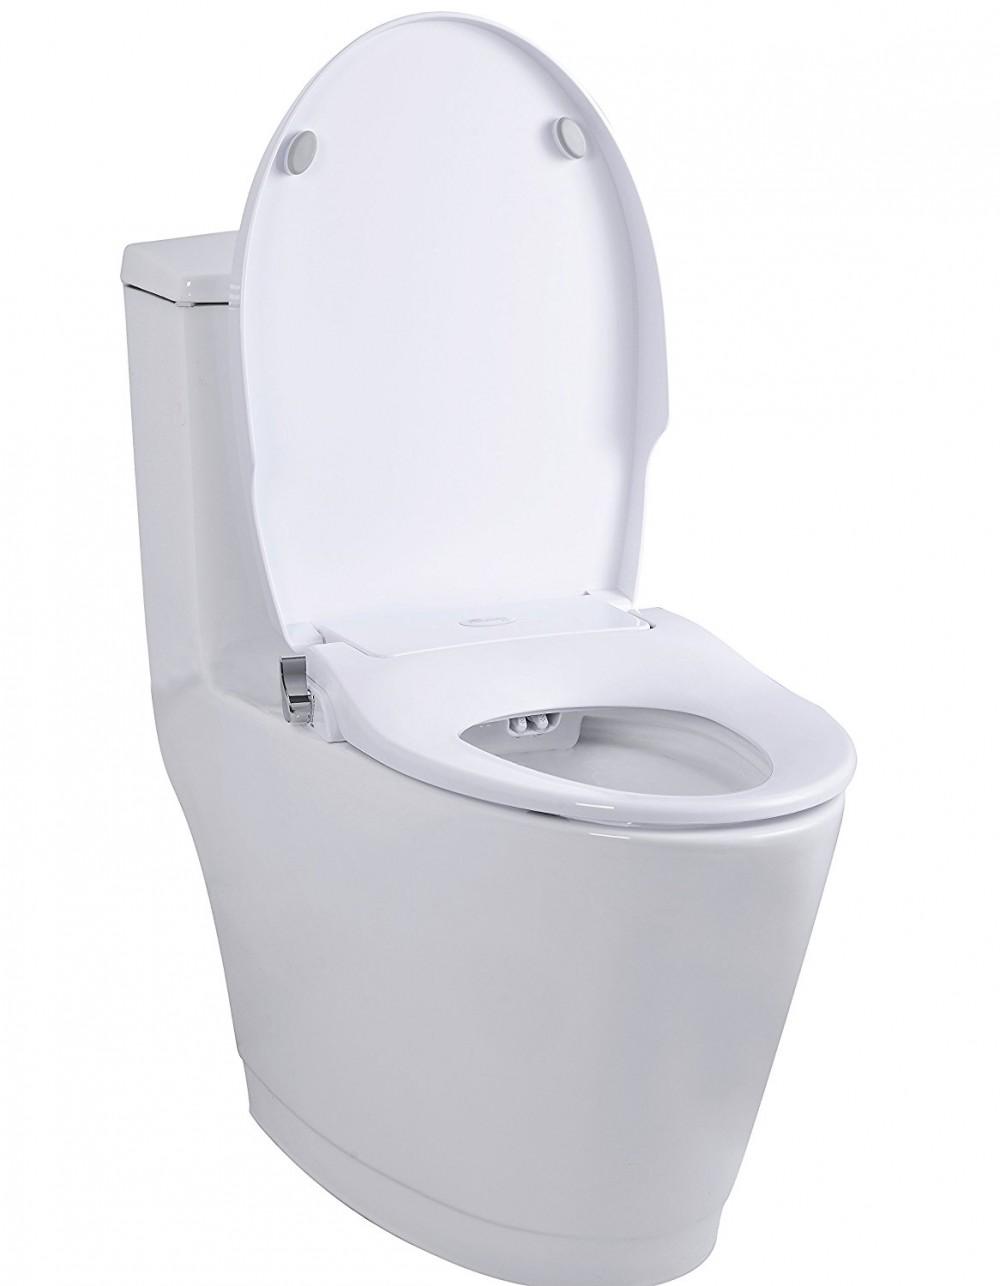 Maro d italia fp106 ohne strom stromlos dusch wc aufsatz aquaclean